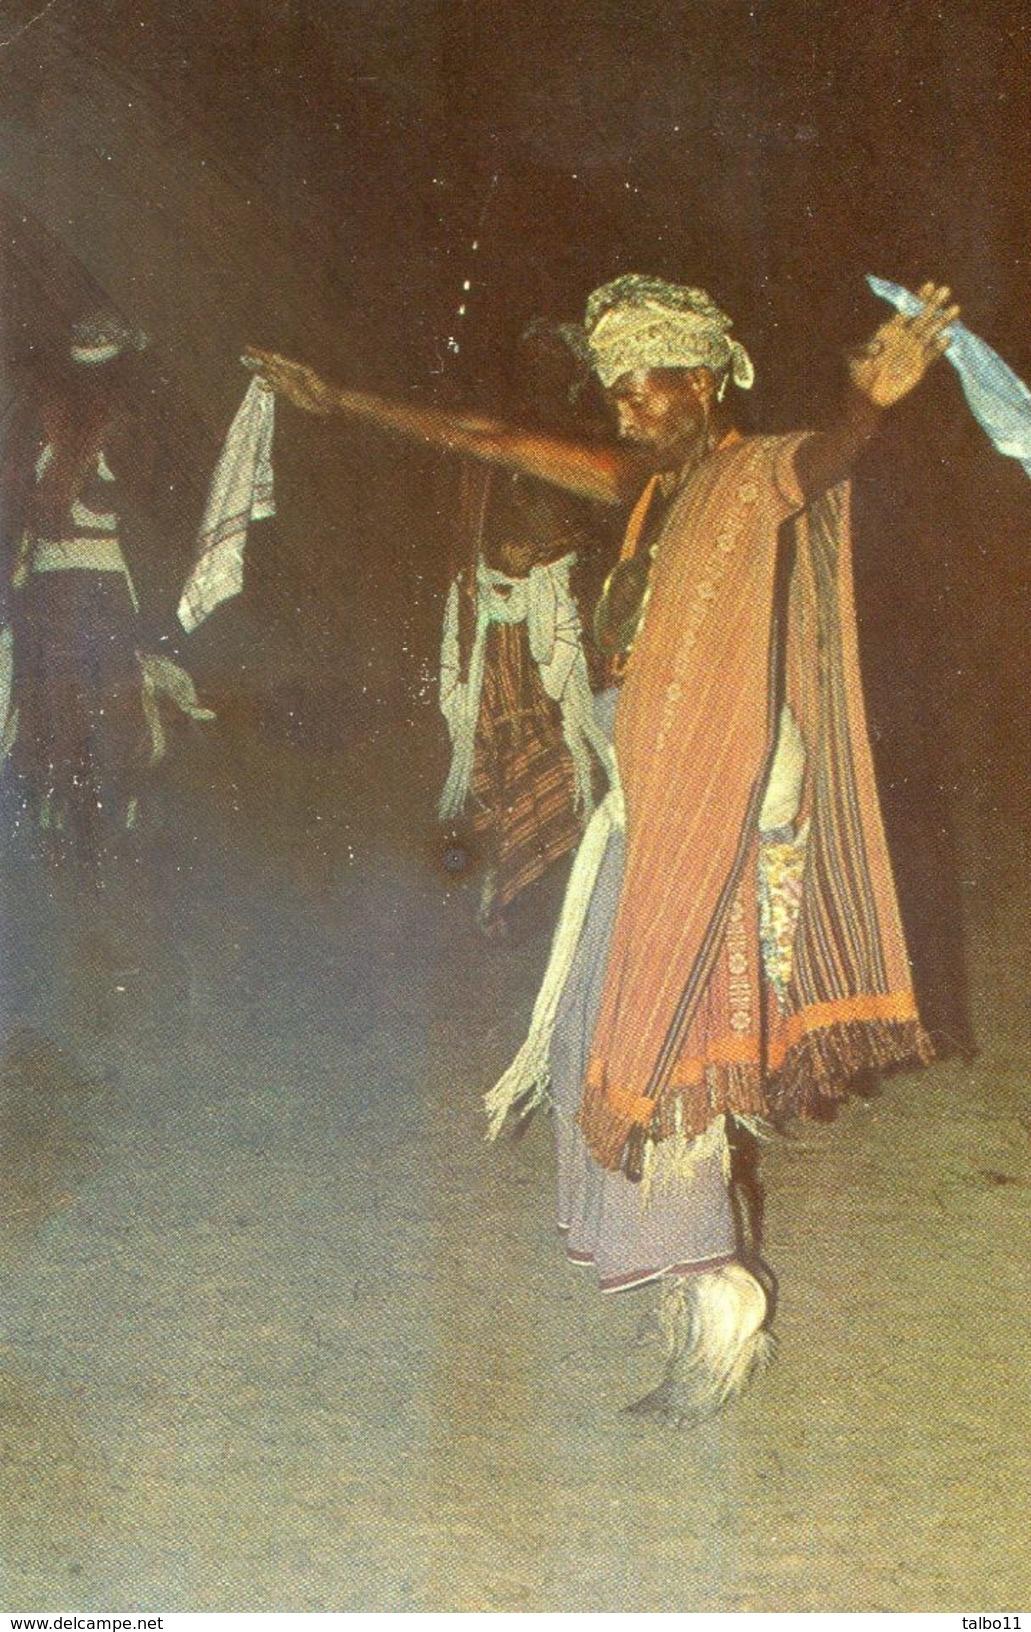 Timor - Guerreiro De Atesabe - Danse Avec Deux Mouchoirs - Timor Oriental